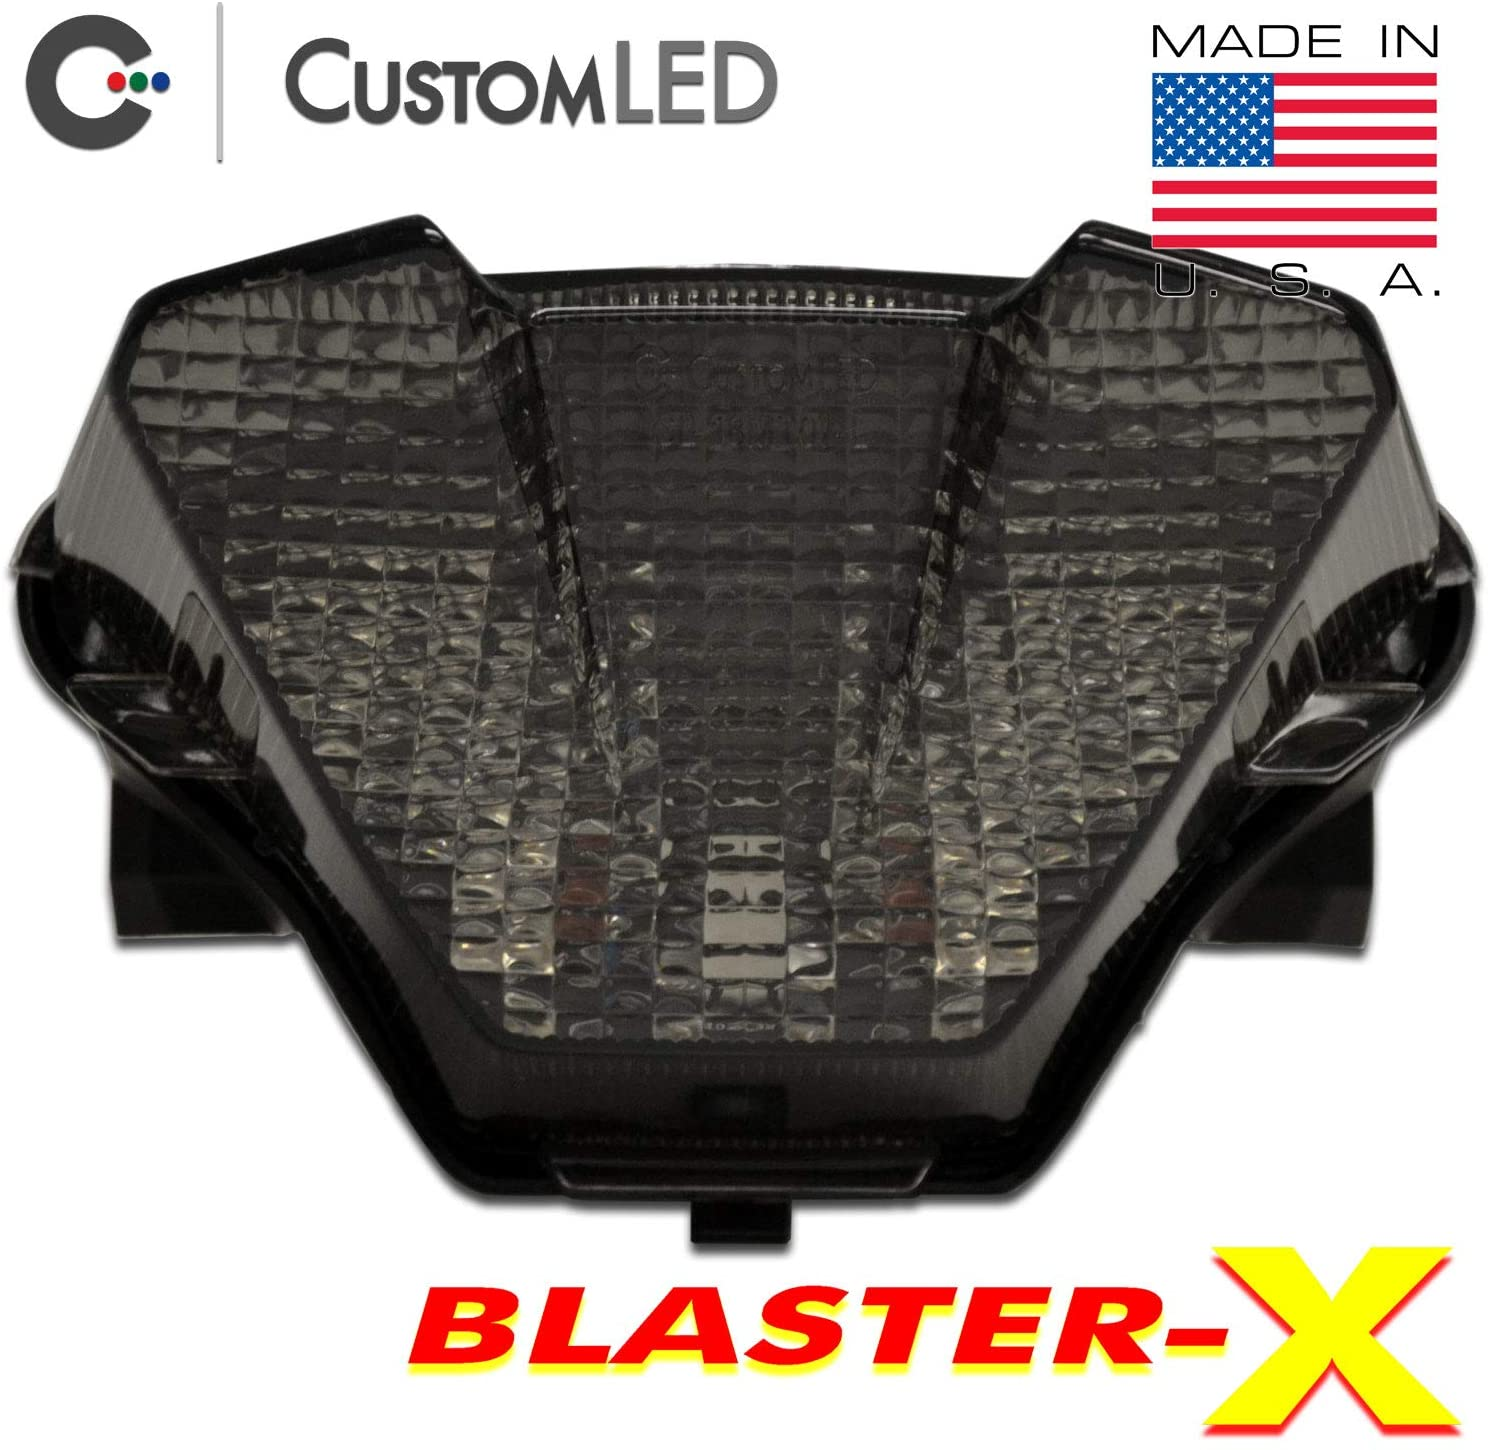 2018-2020 Yamaha MT-07 Blaster-X Integrated LED Tail Light - Smoked Lens